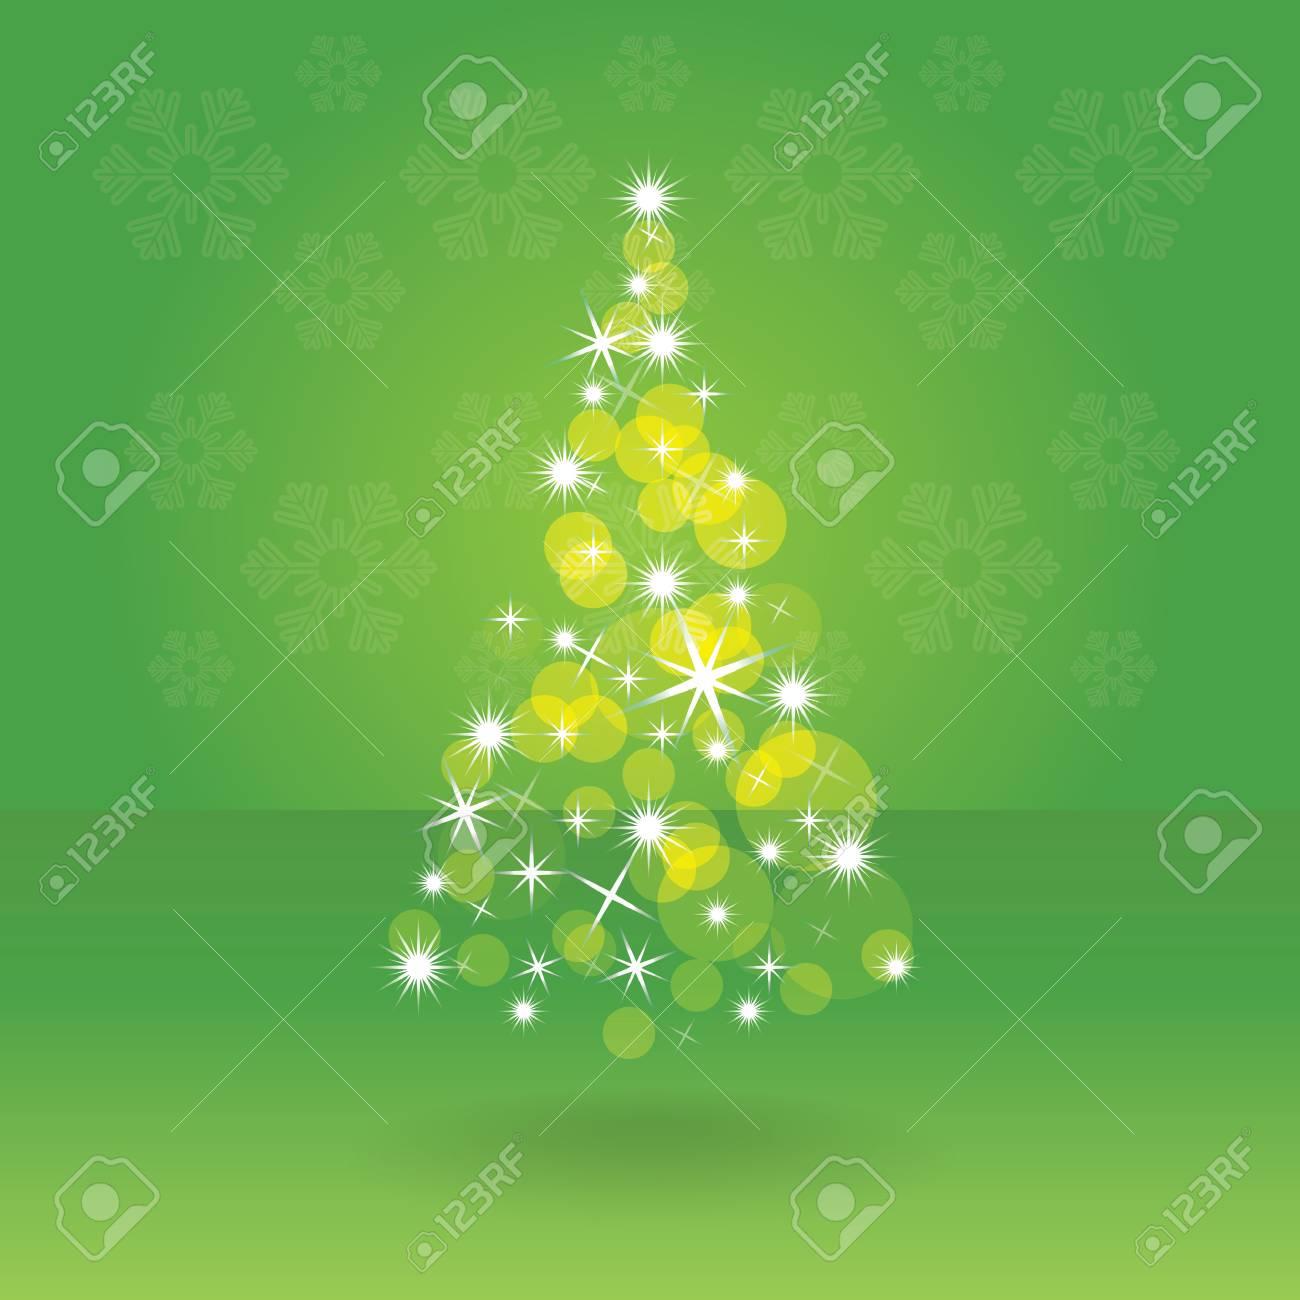 Shiny abstract christmas tree, illustration Stock Vector - 15173157